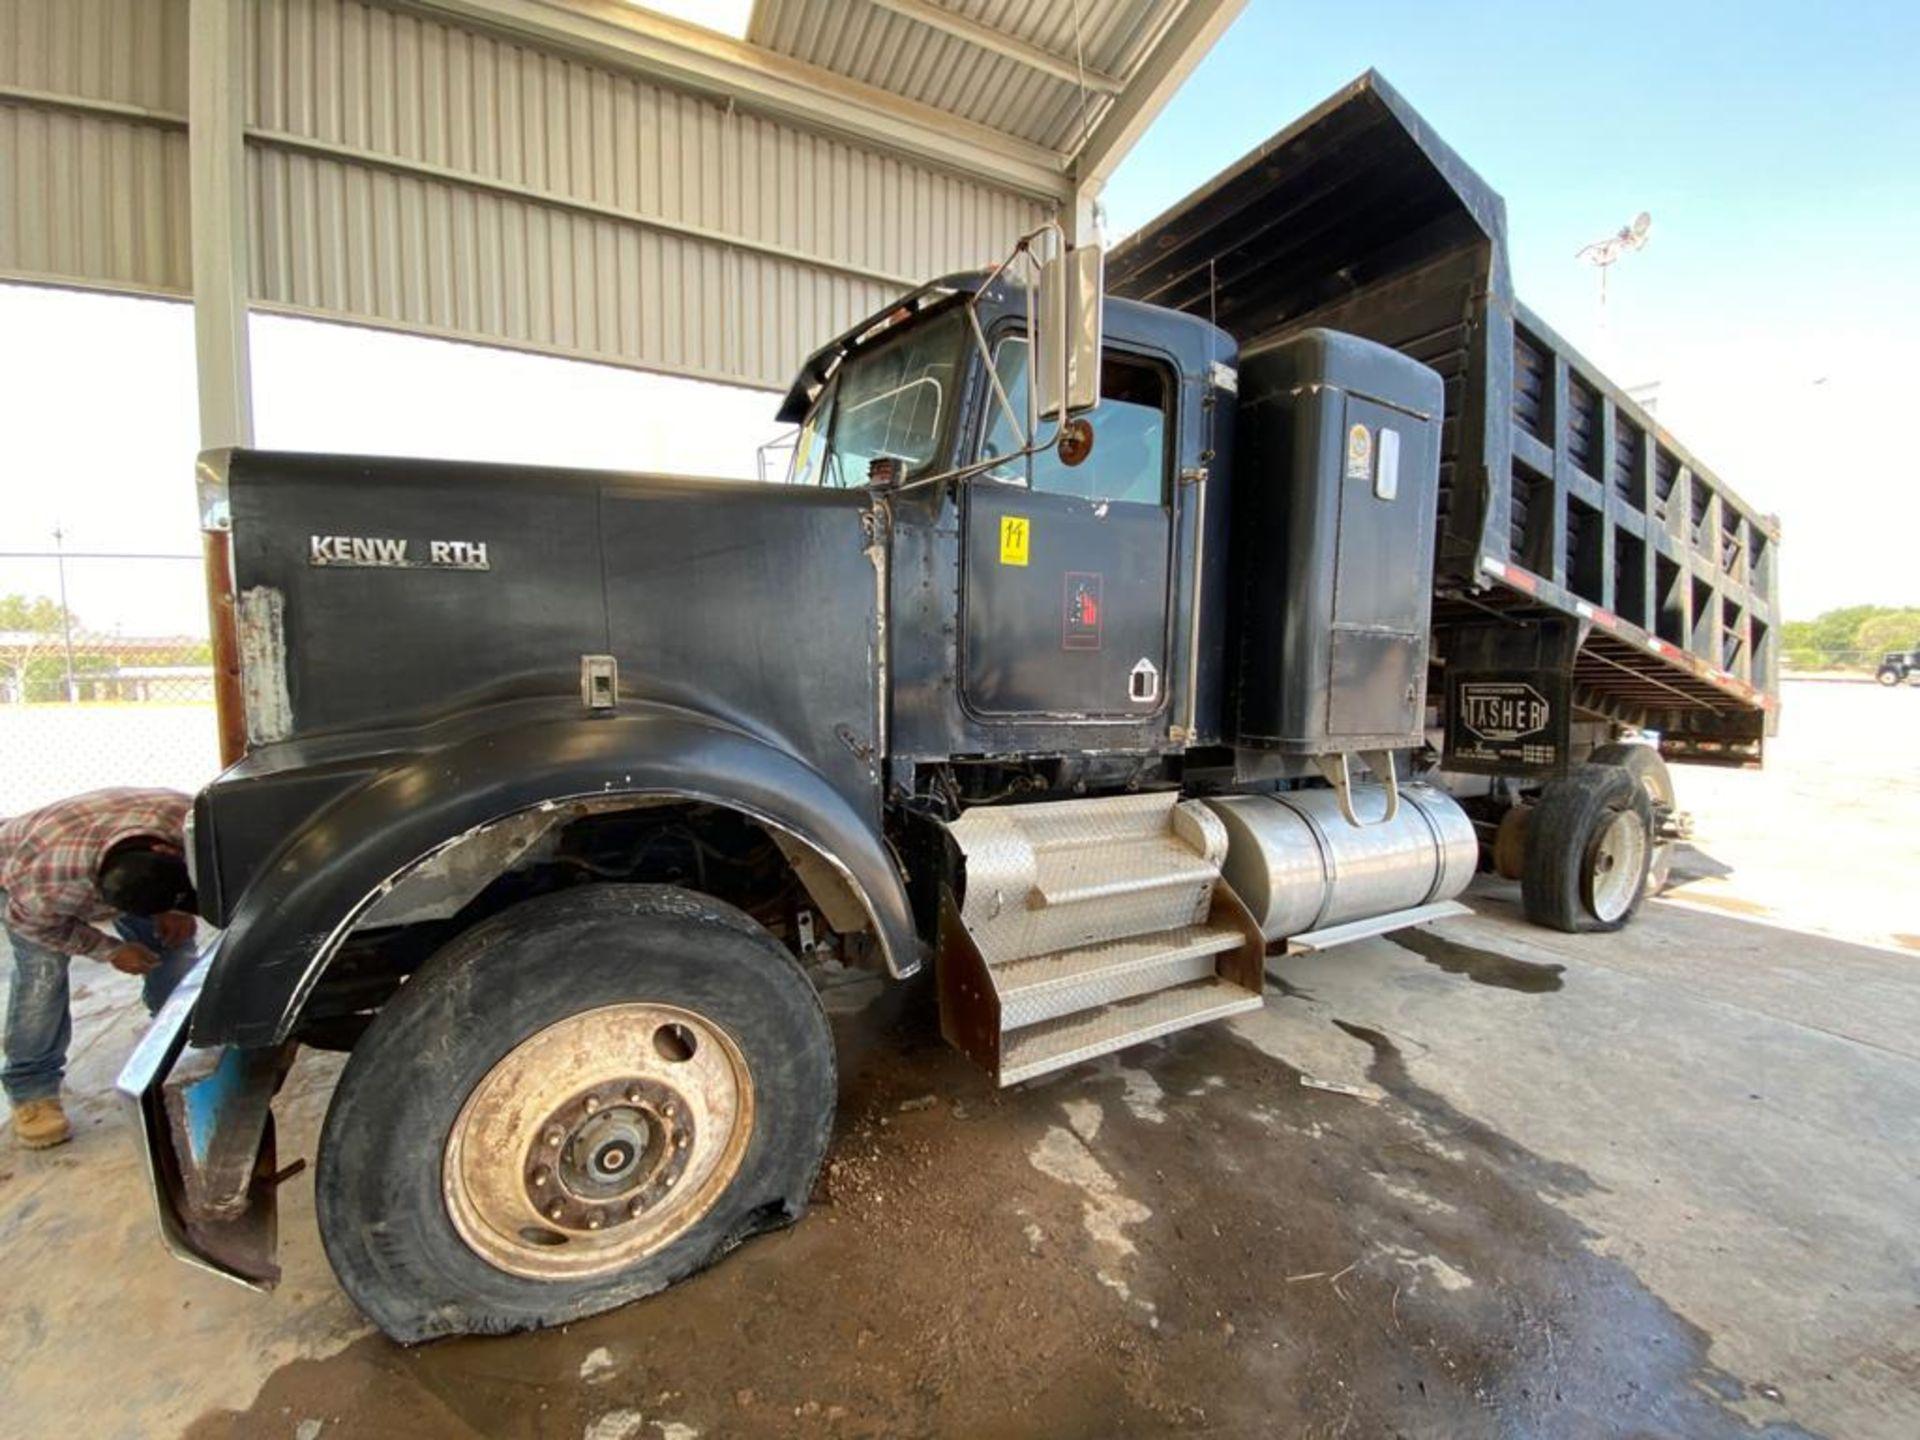 1983 Kenworth Dump Truck, standard transmission of 10 speeds, with Cummins motor - Image 49 of 68